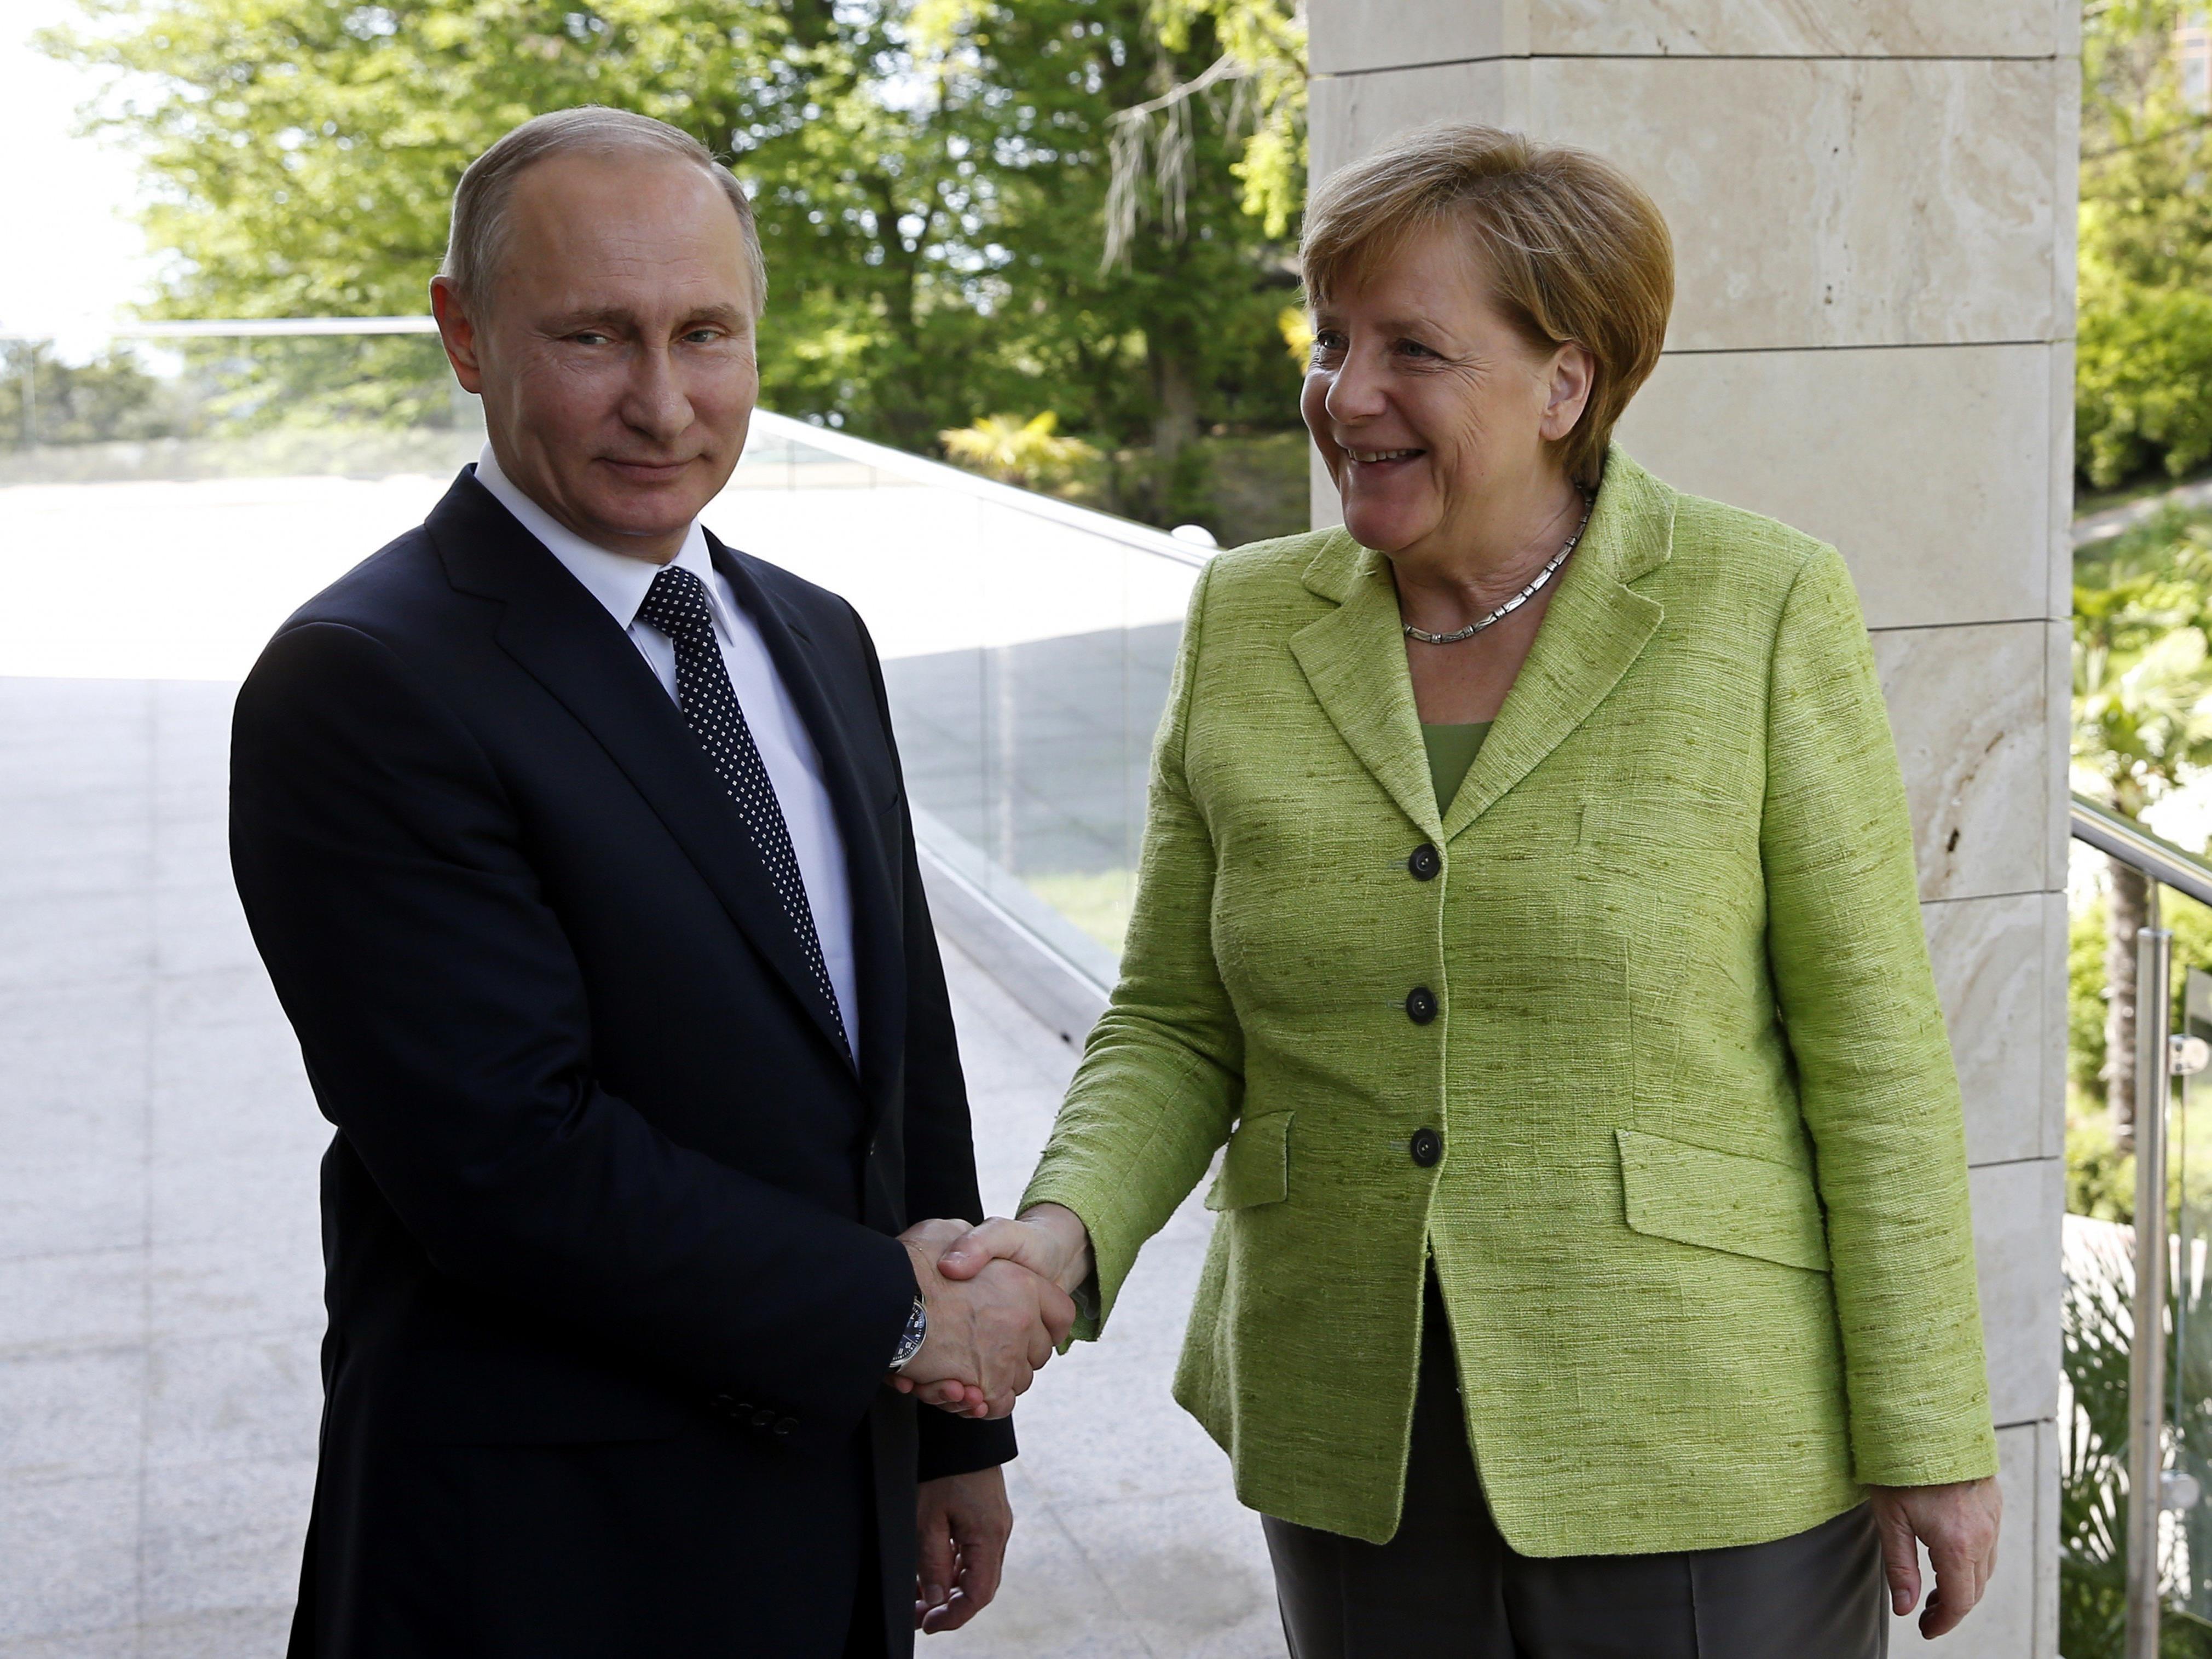 Angela Merkel traf sich Anfang mai mit Wladimir Putin in Sotschi.